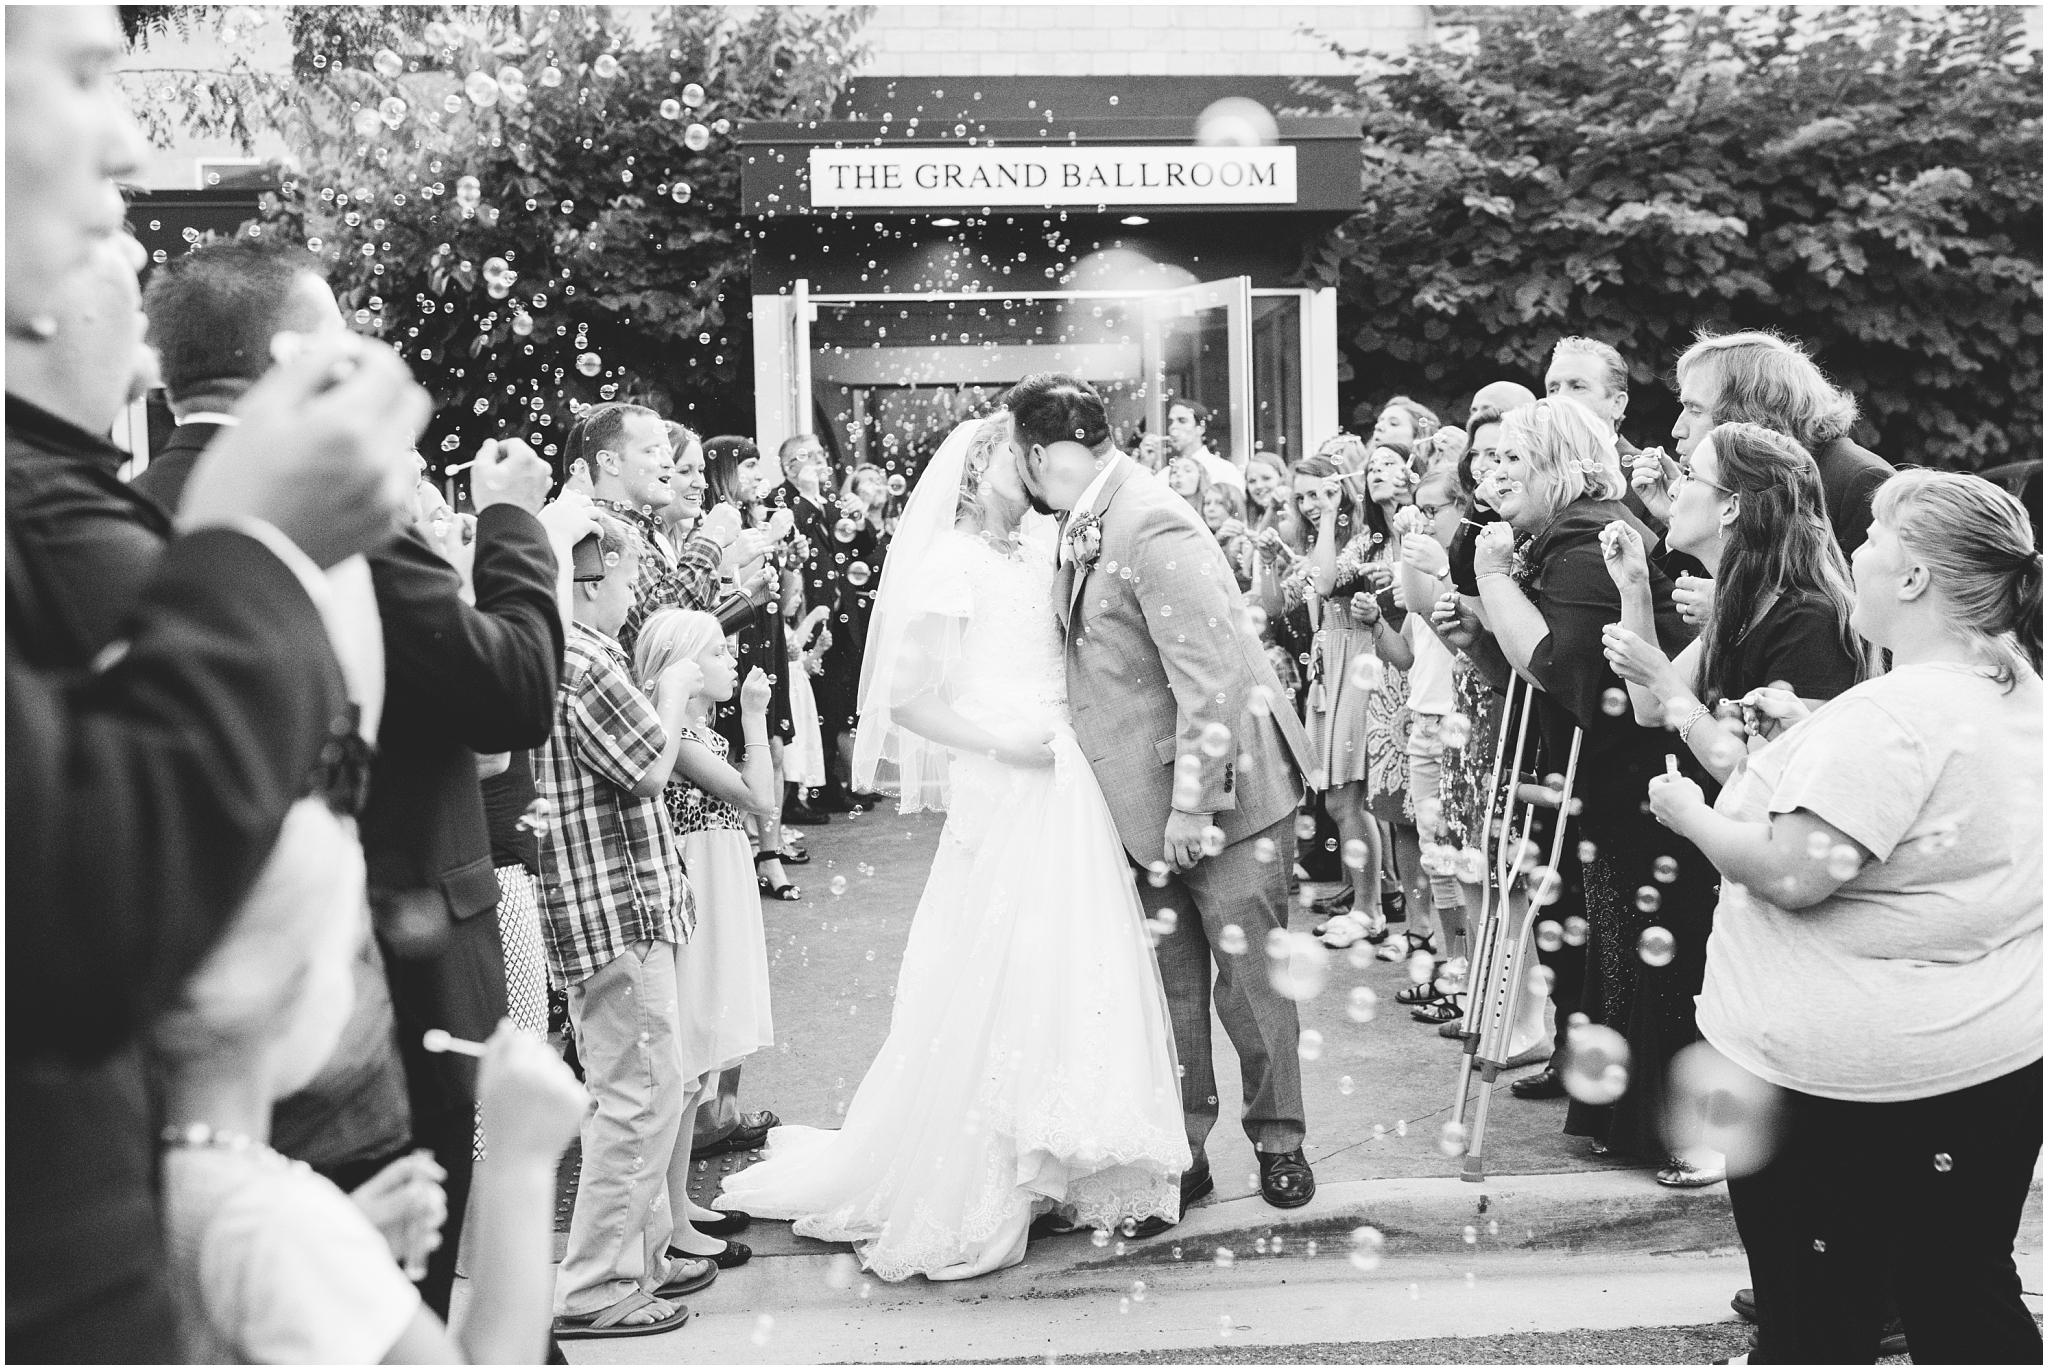 Justin and Melissa-484BW_Lizzie-B-Imagery-Utah-Wedding-Photographer-Salt-Lake-City-Temple-The-Grand-Ballroom.jpg